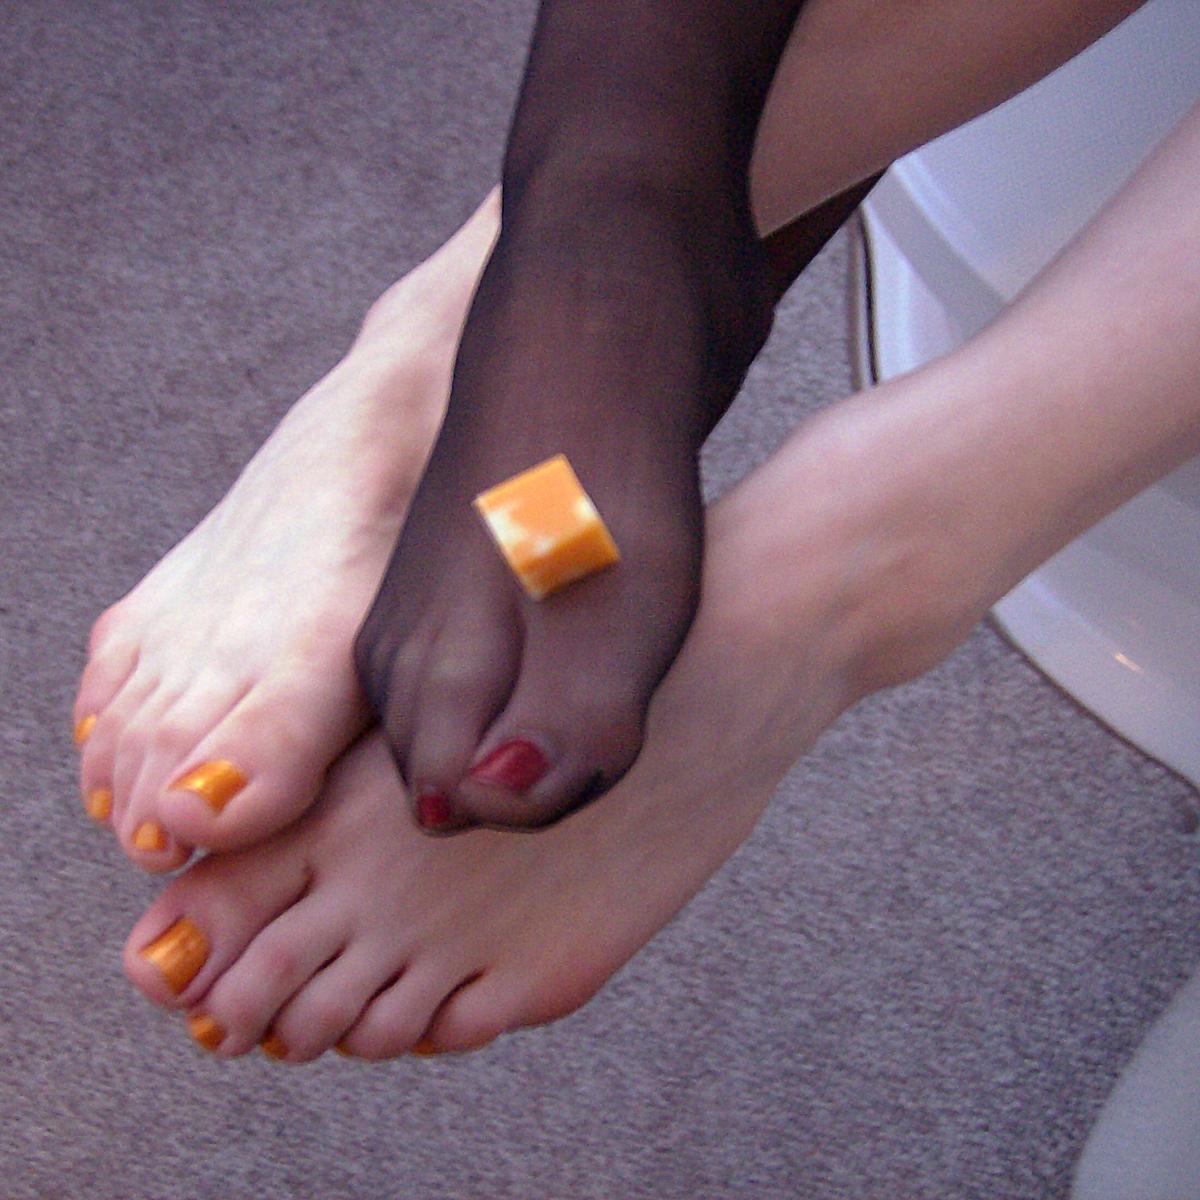 Qvc Shawn Killinger Feet - newhairstylesformen2014.com